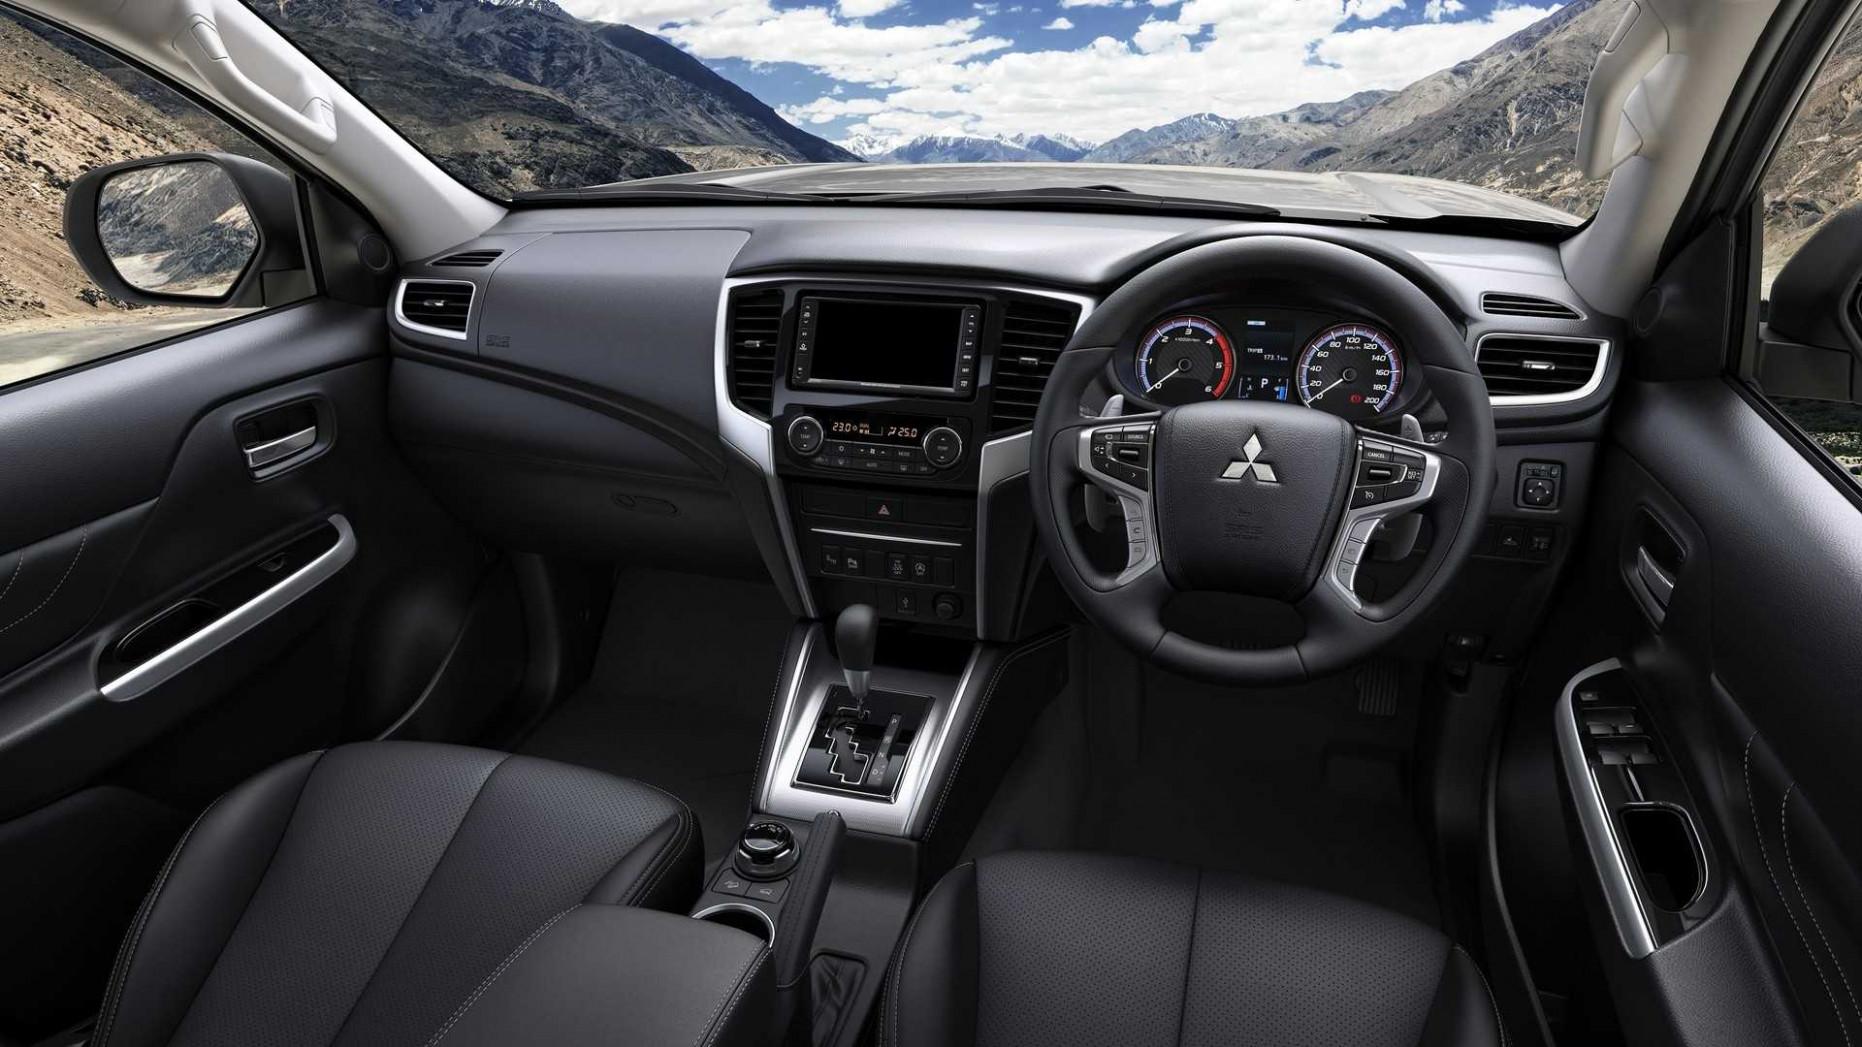 Configurations L200 Mitsubishi 2022 Interior